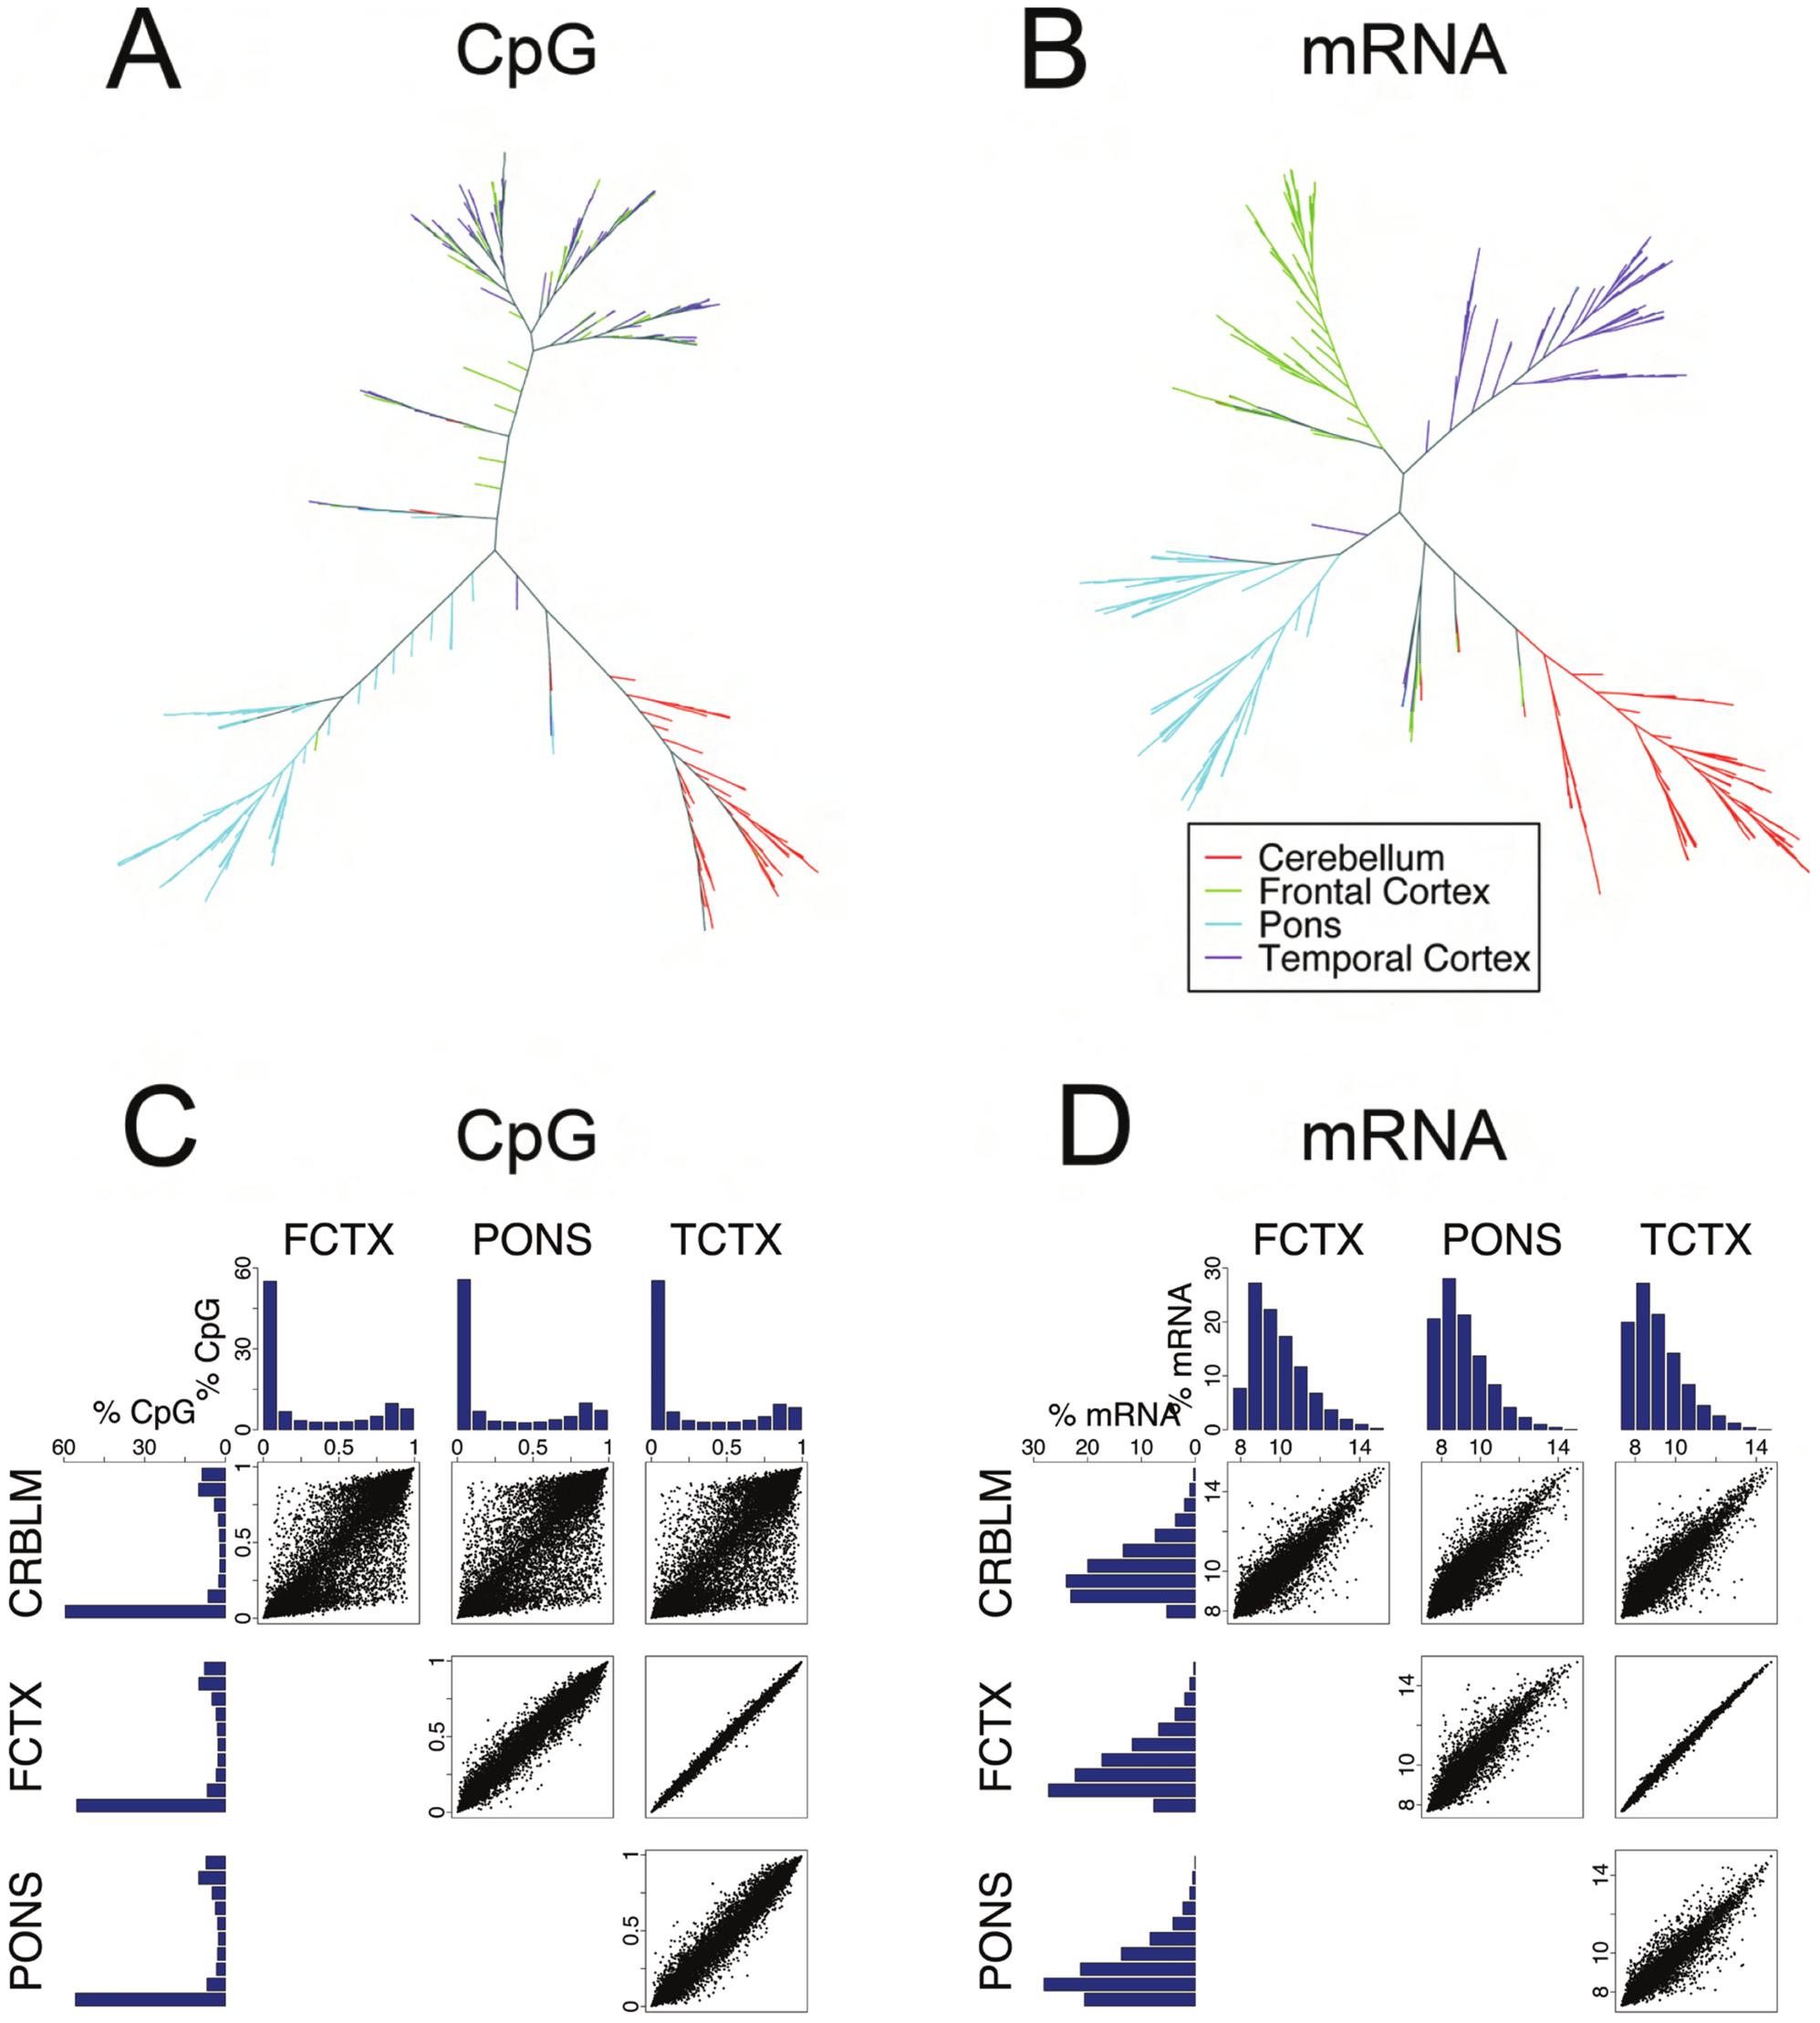 Analysis of CpG methylation and mRNA measures across four human brain regions.